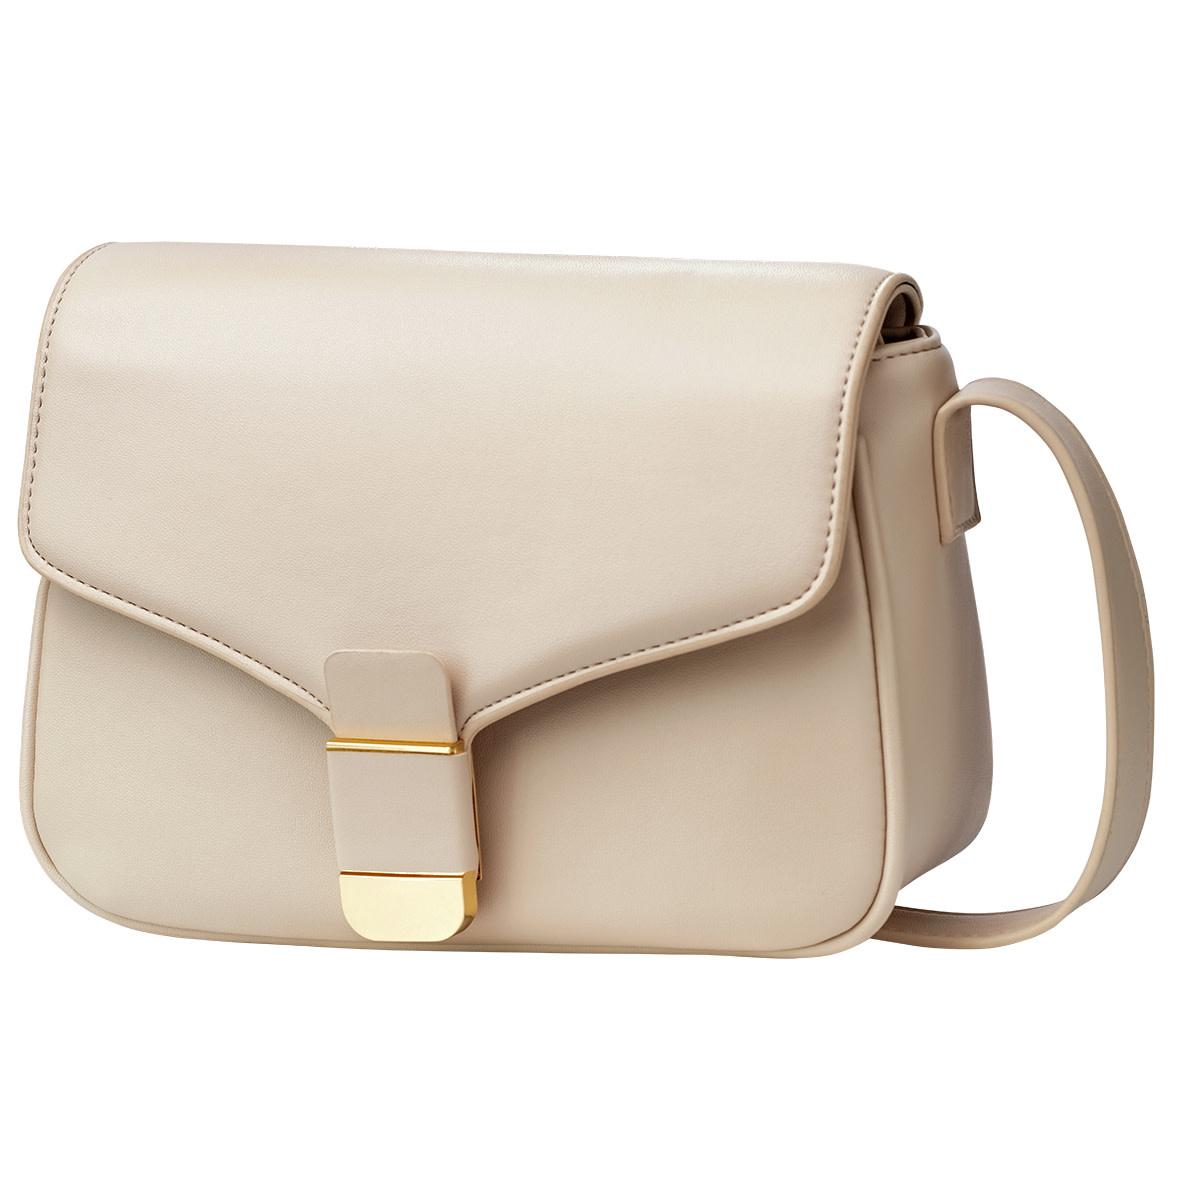 With love Bag beige 22cm x 17cm x 9cm